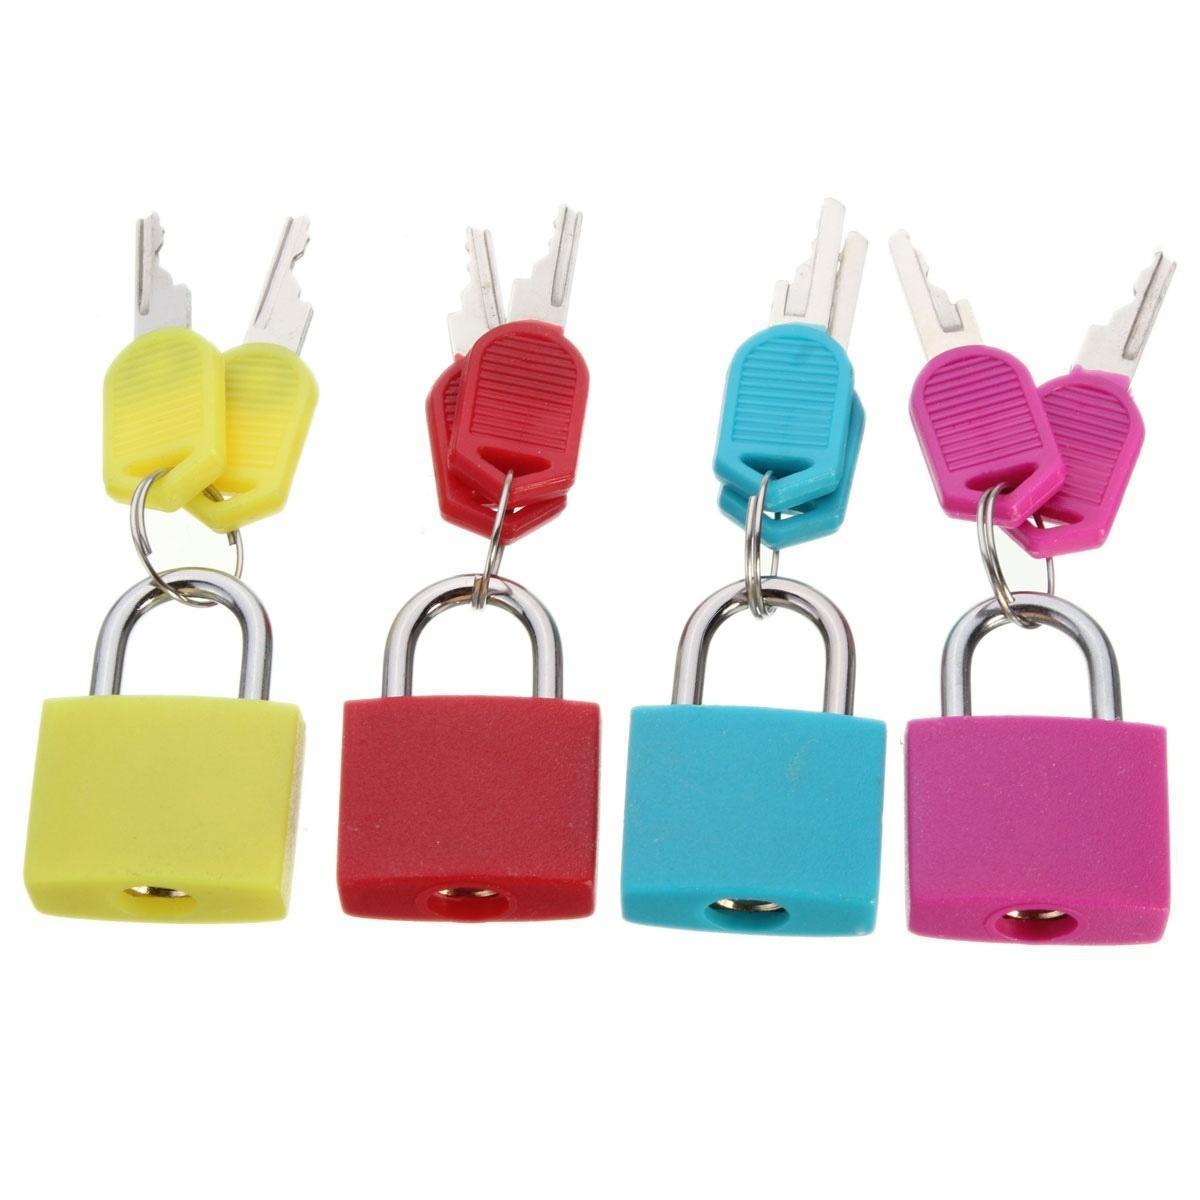 20 мм Латунь чемодан багажа ноутбук сумка замок замок с двумя ключами